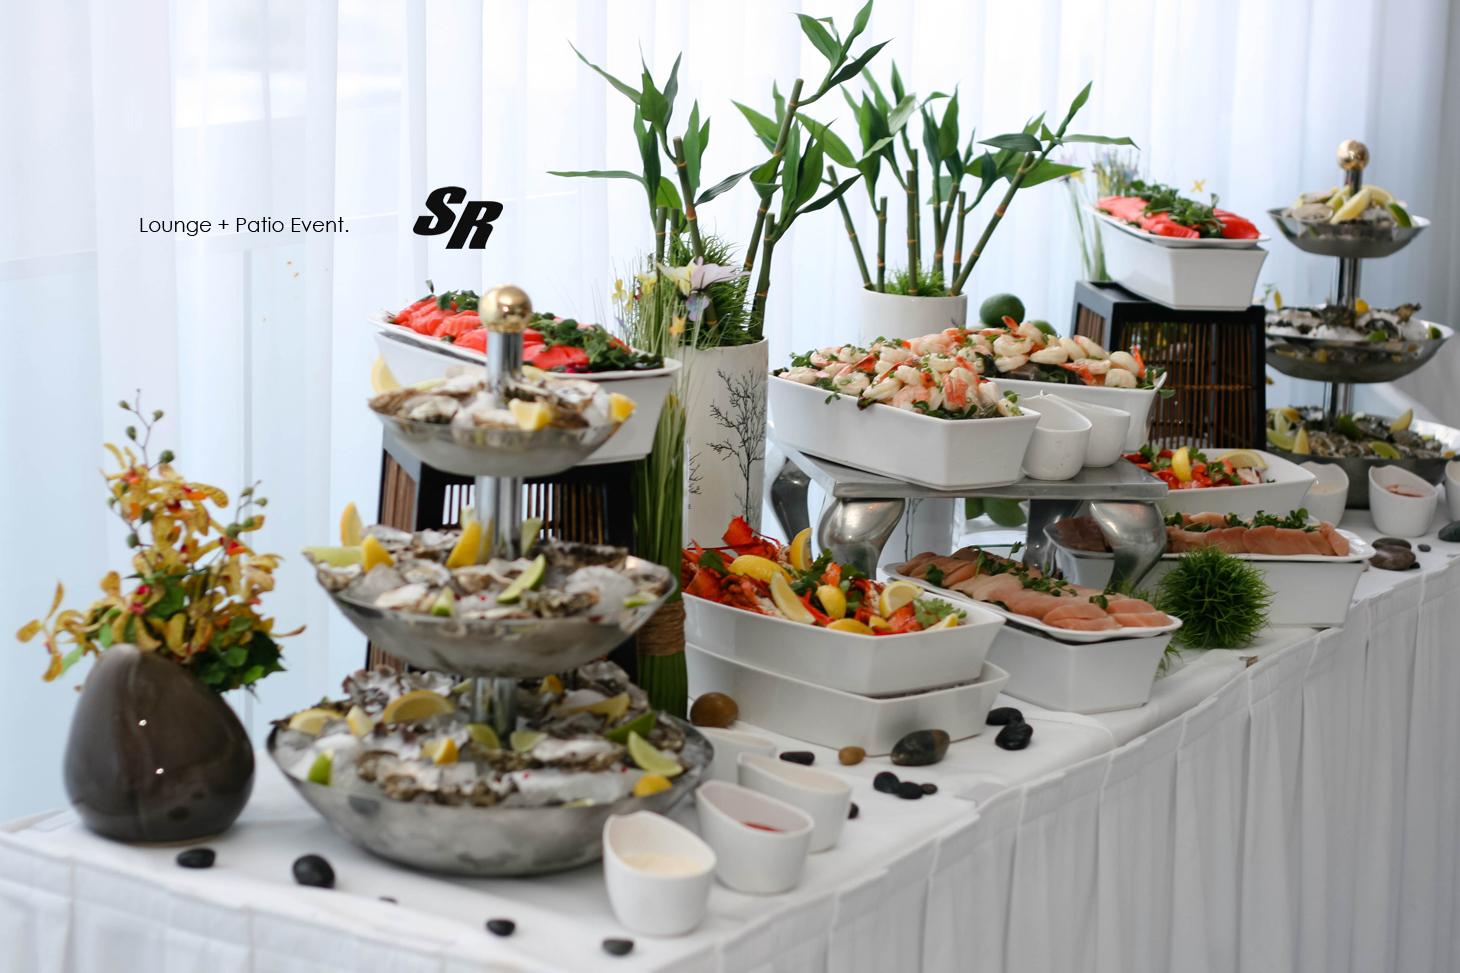 SR Lounge + Patio Event